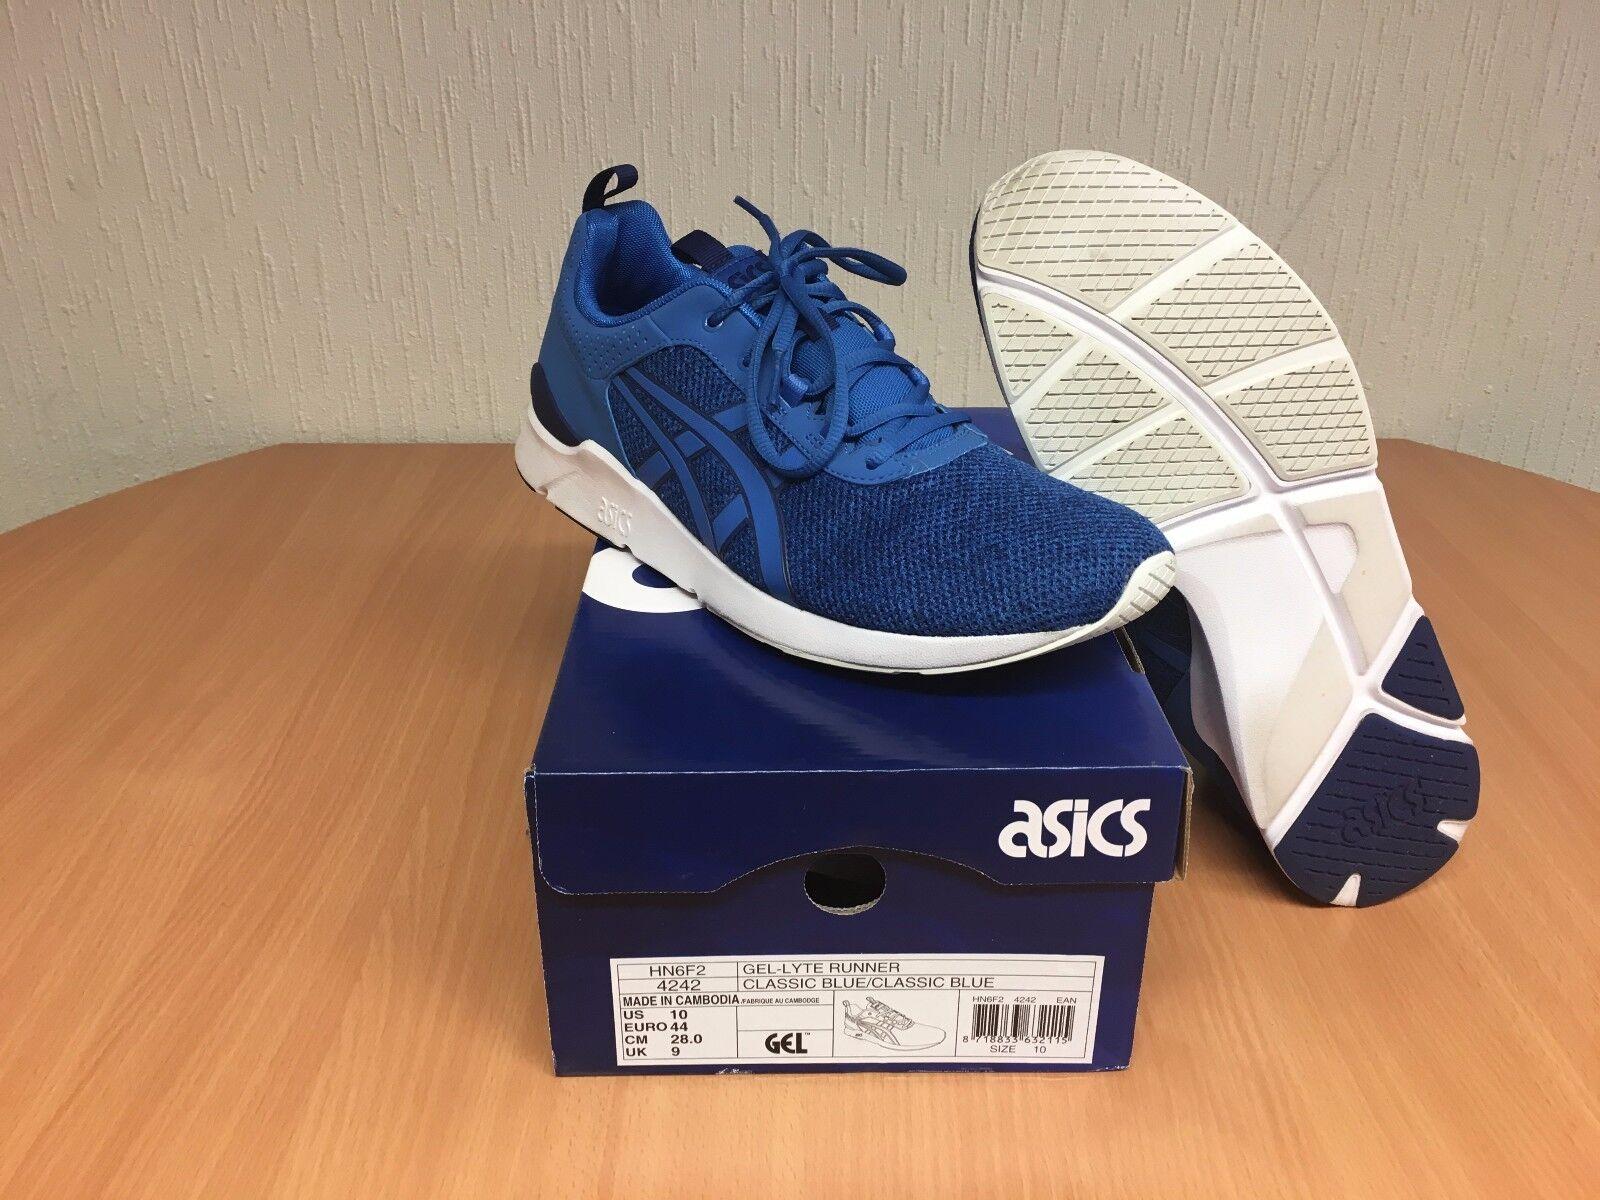 Asics GEL-Lyte Runner HN6F2 4242, Gr. 44, blau, Top mit Karton!